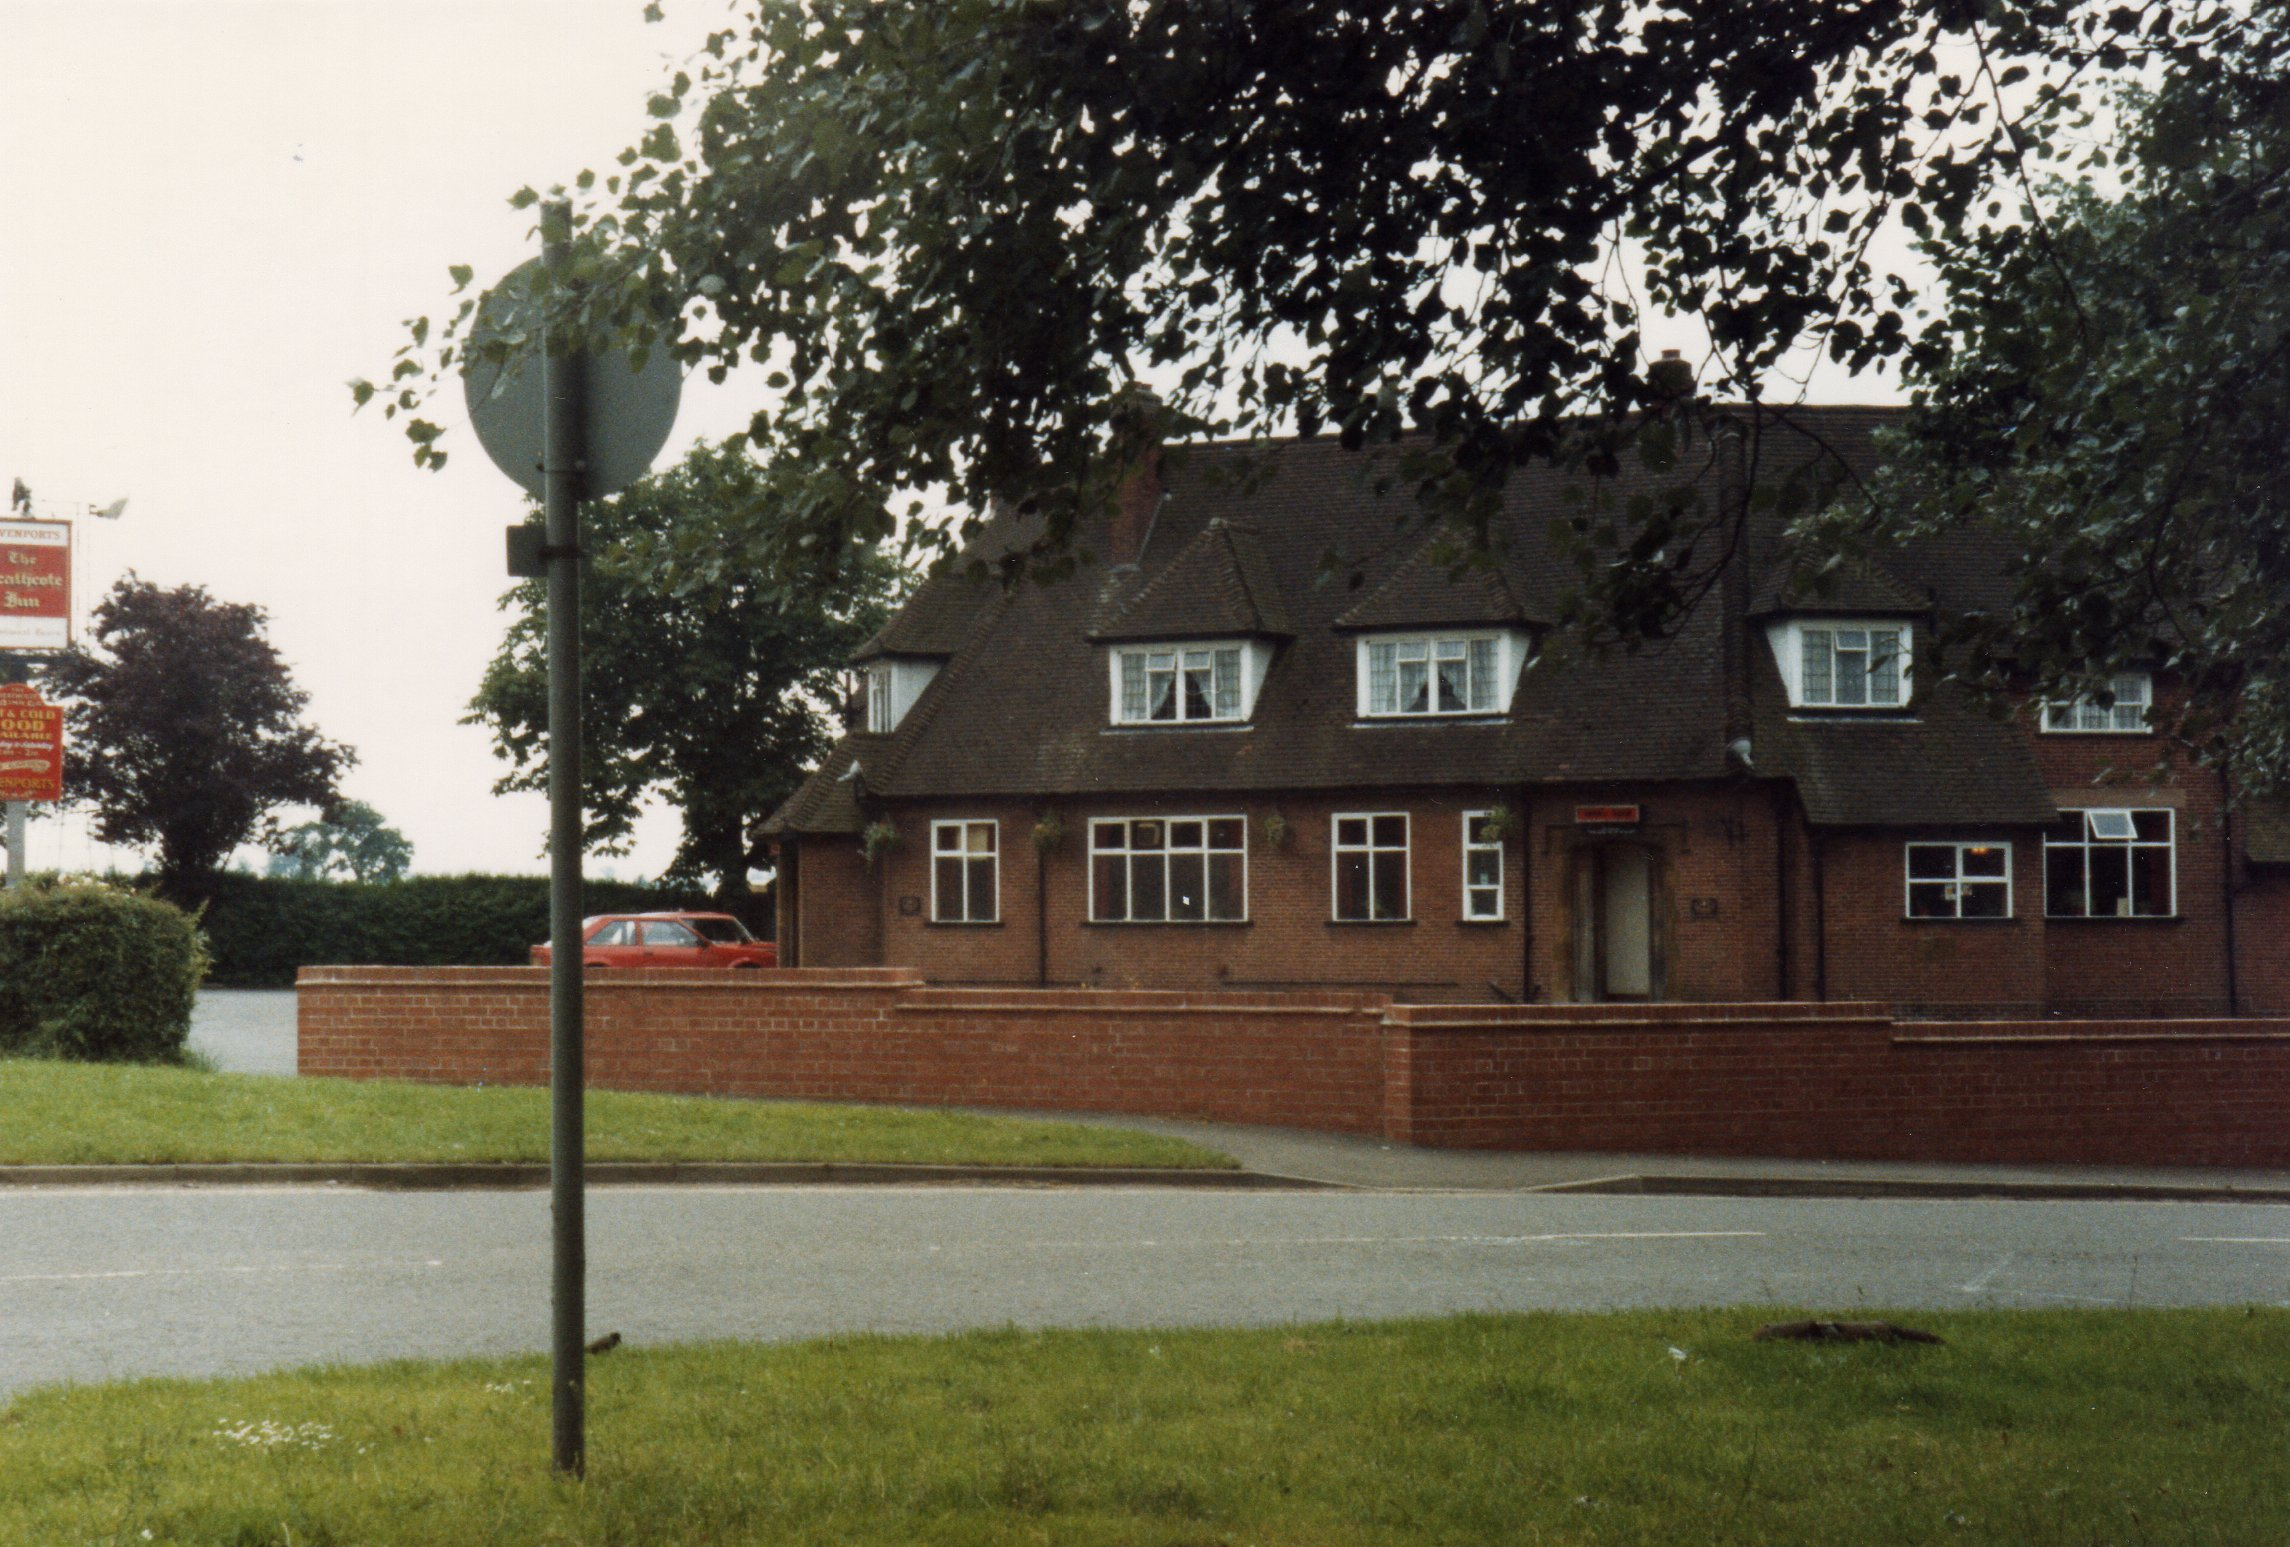 The Heathcote Inn